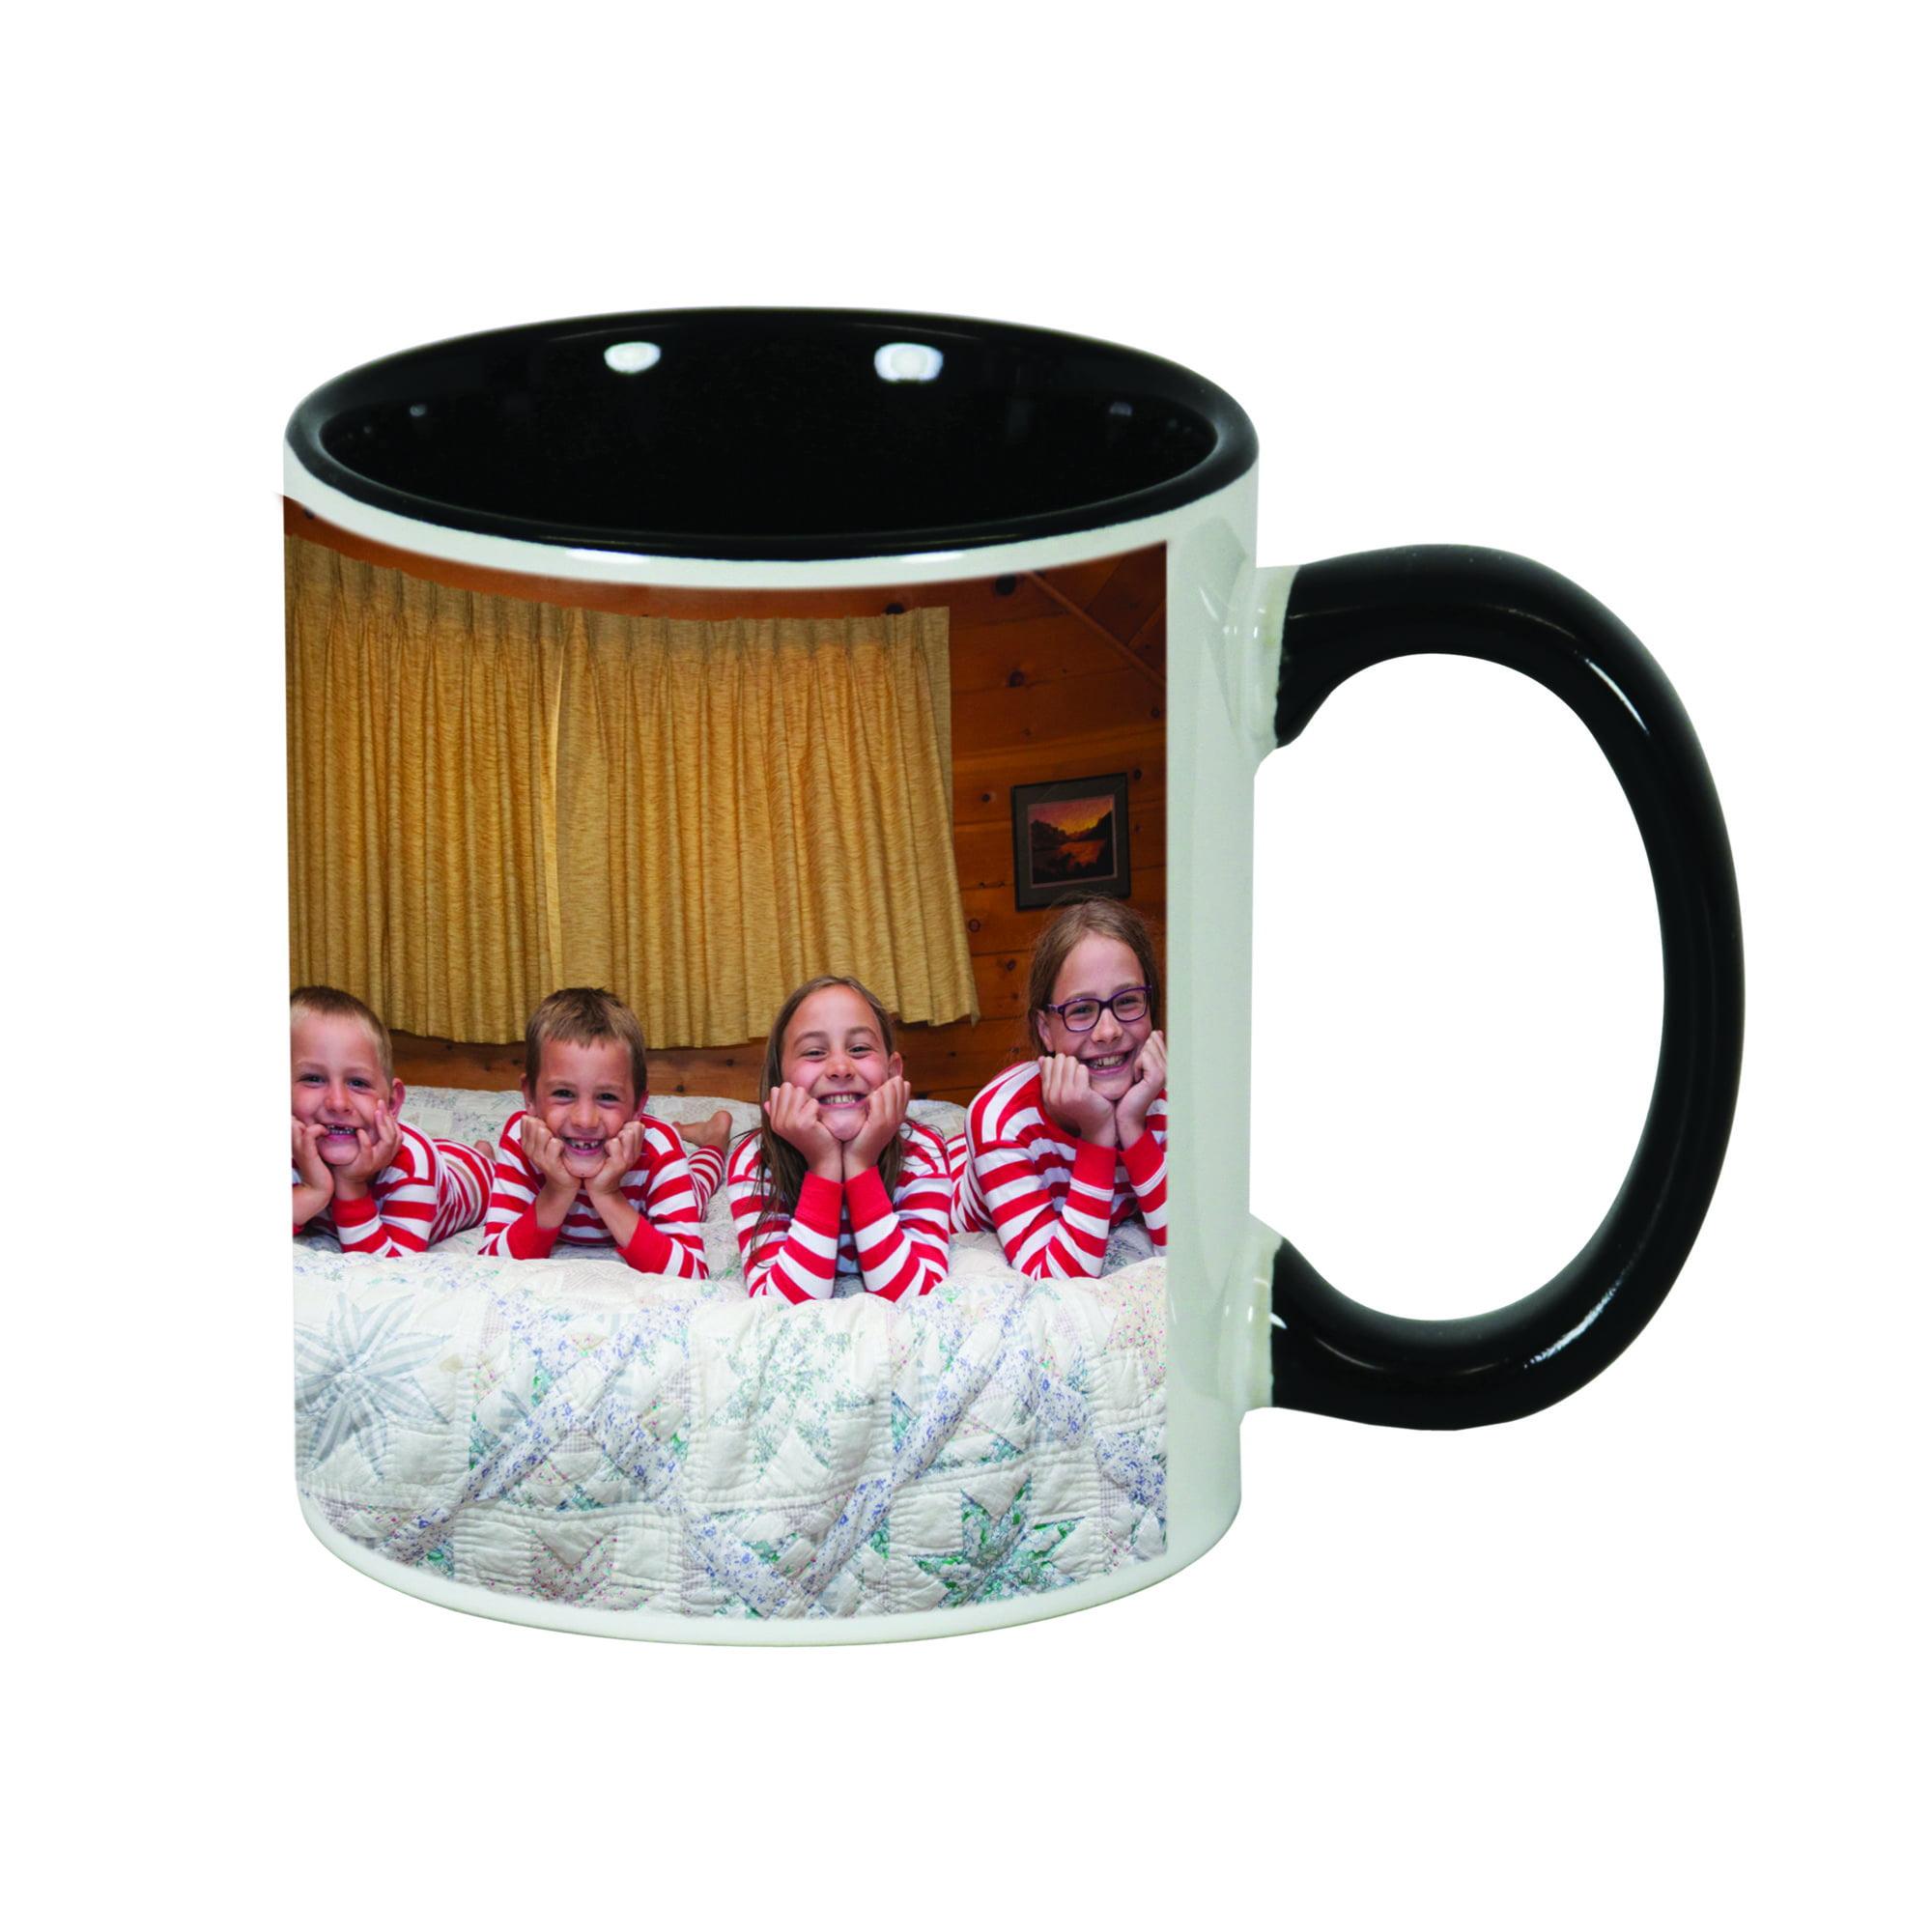 Black Photo Mug 11 oz